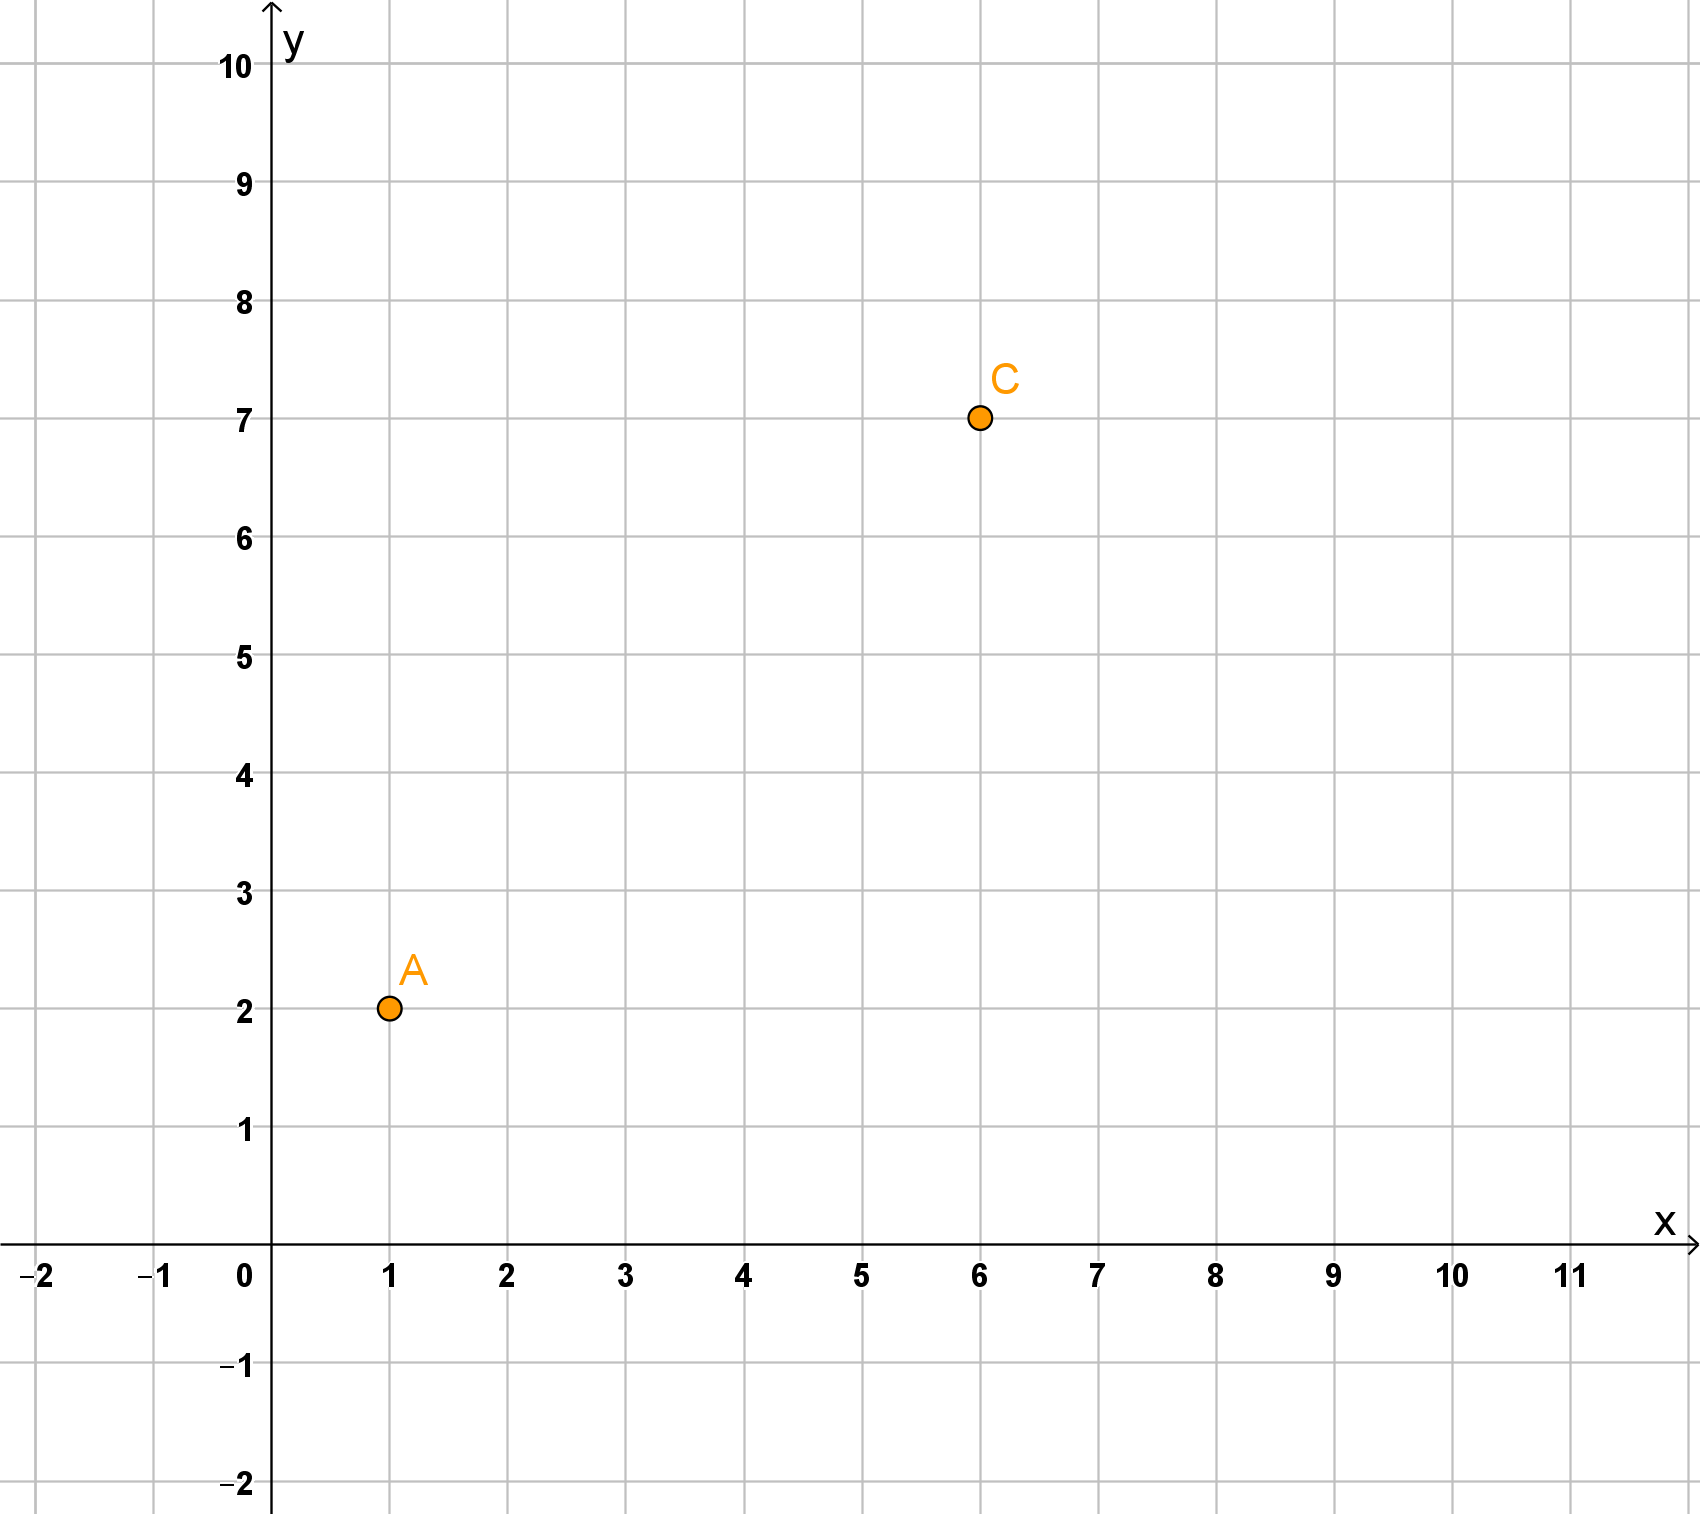 Koordinatensystem mit Punkten